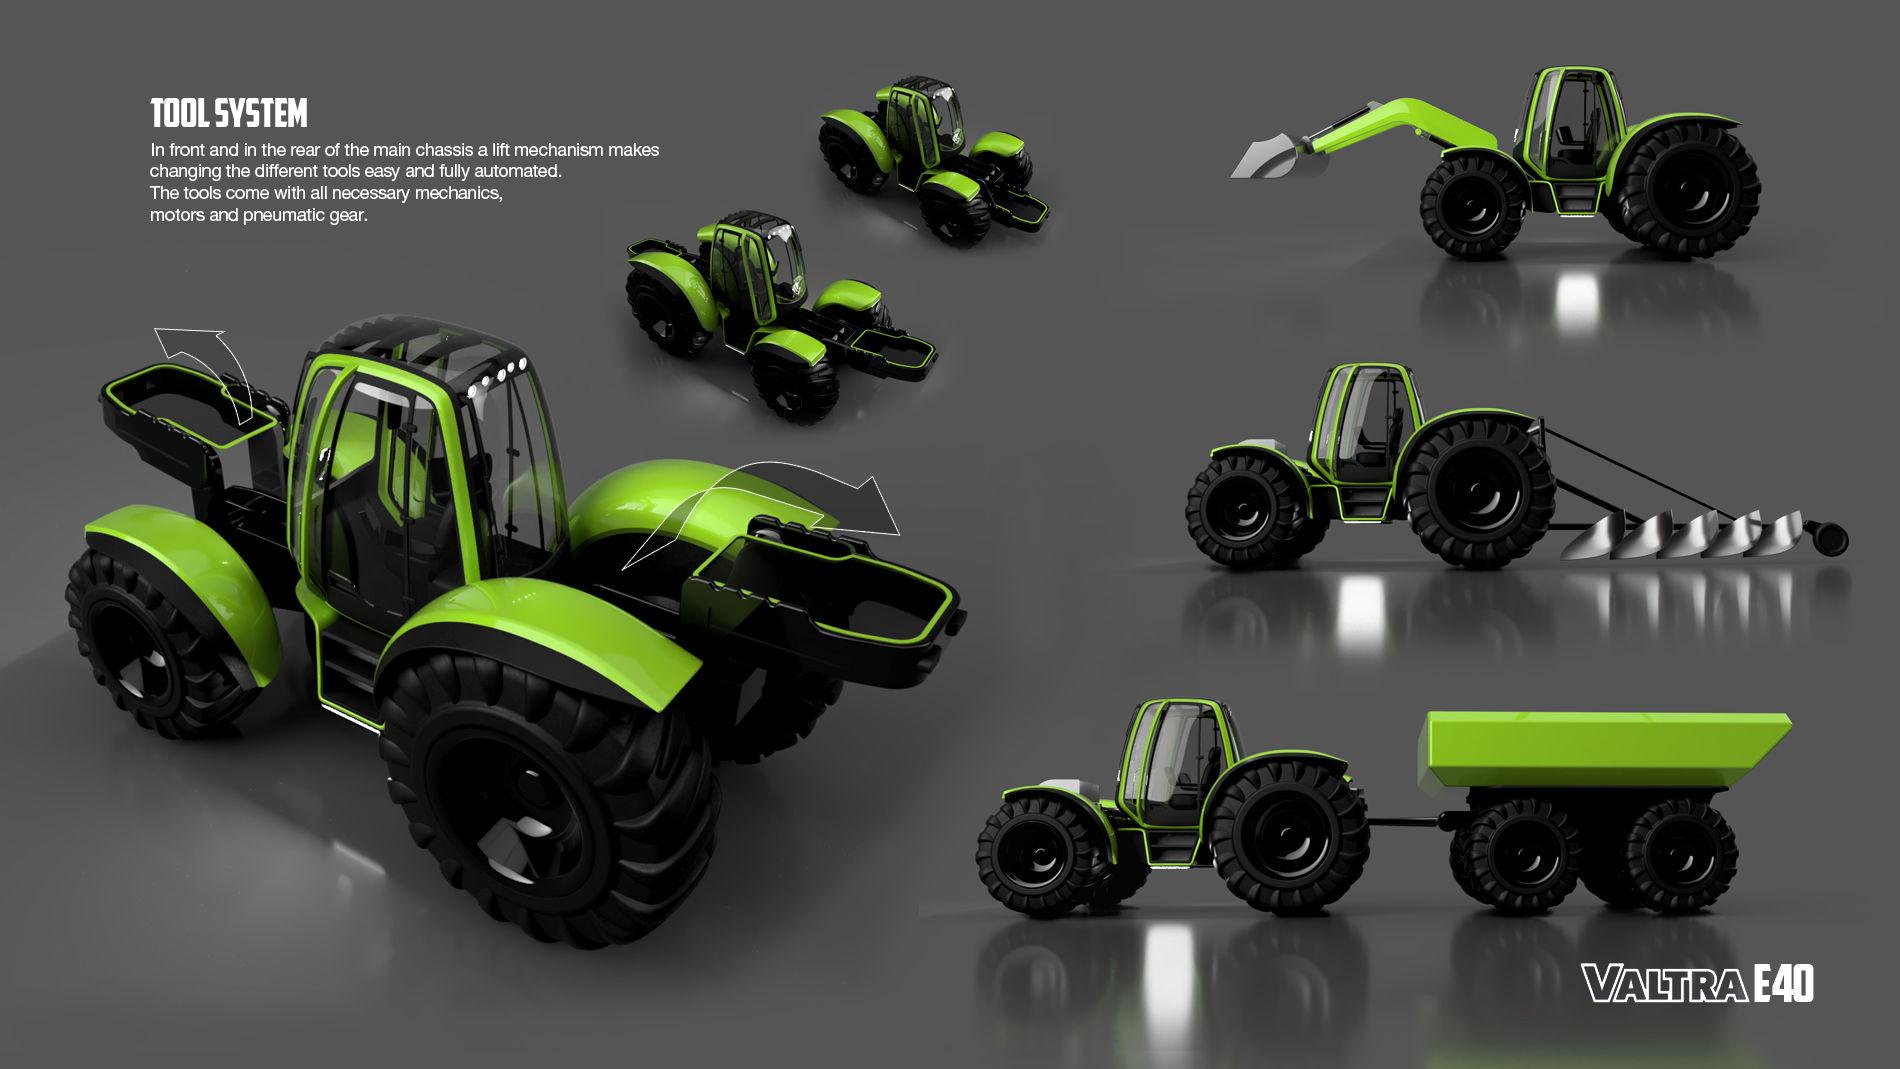 3-tool-system-3500-3500